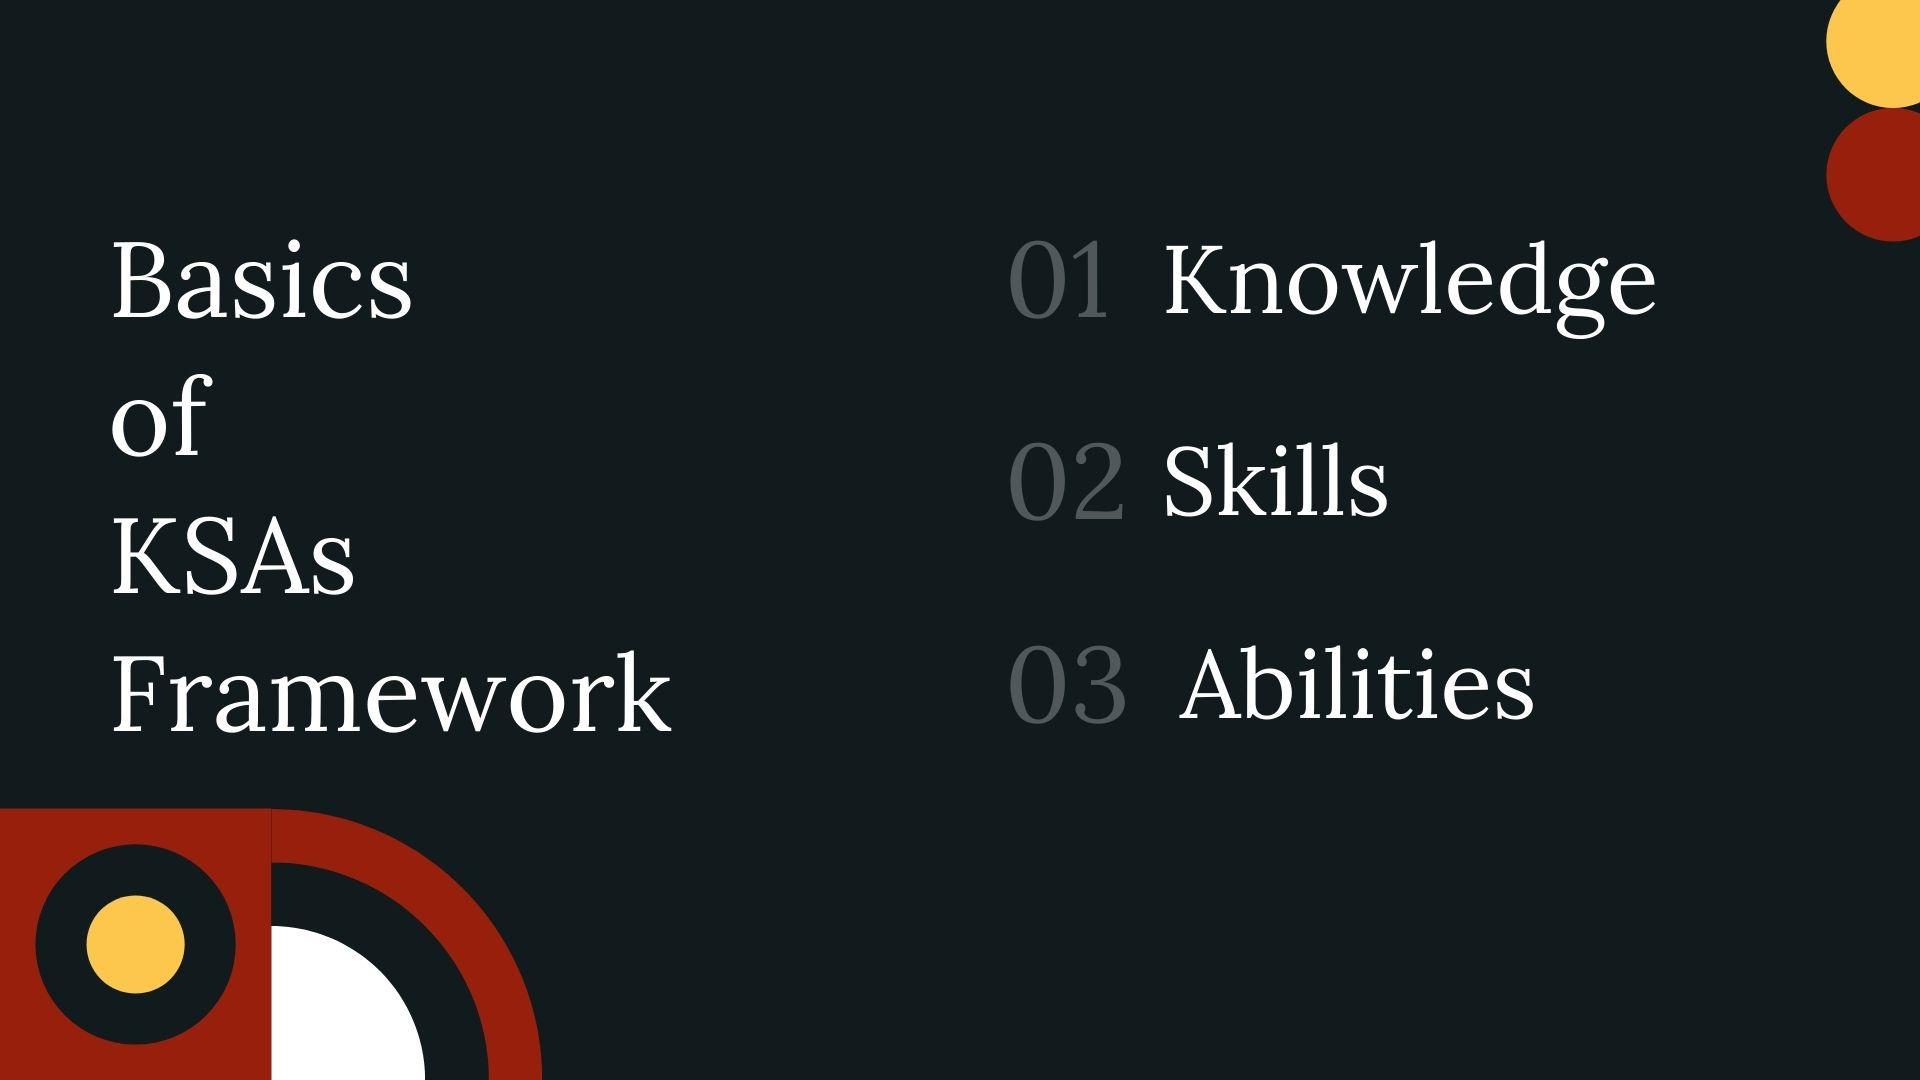 Basics of KSAs (Knowledge, Skills, and Abilities) Framework